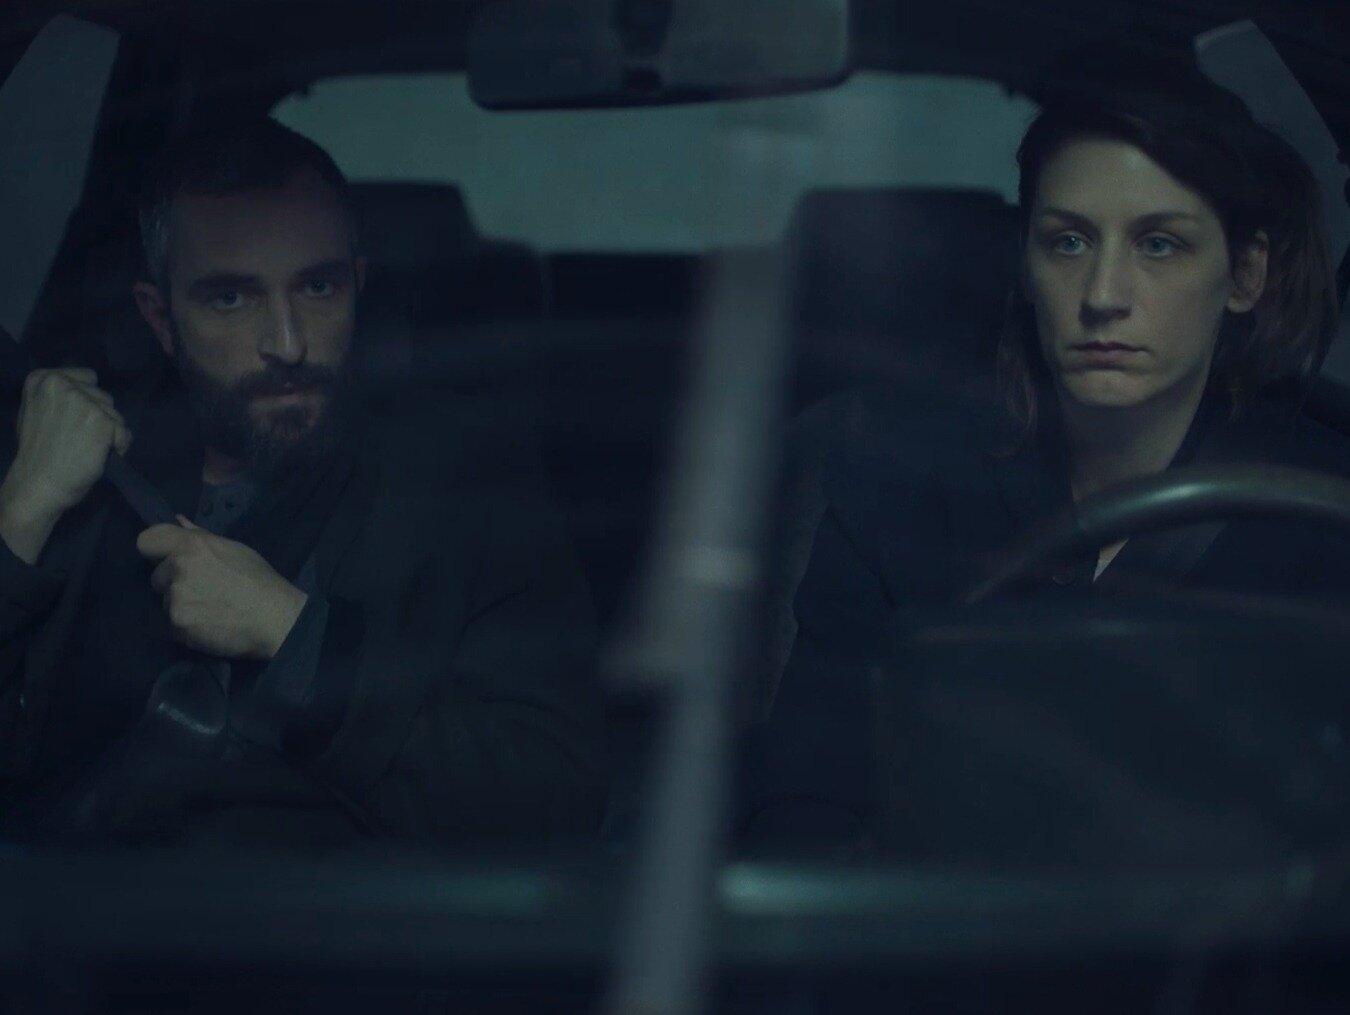 Movie Review: Apples (Christos Nikou, 2020) — Art House Street